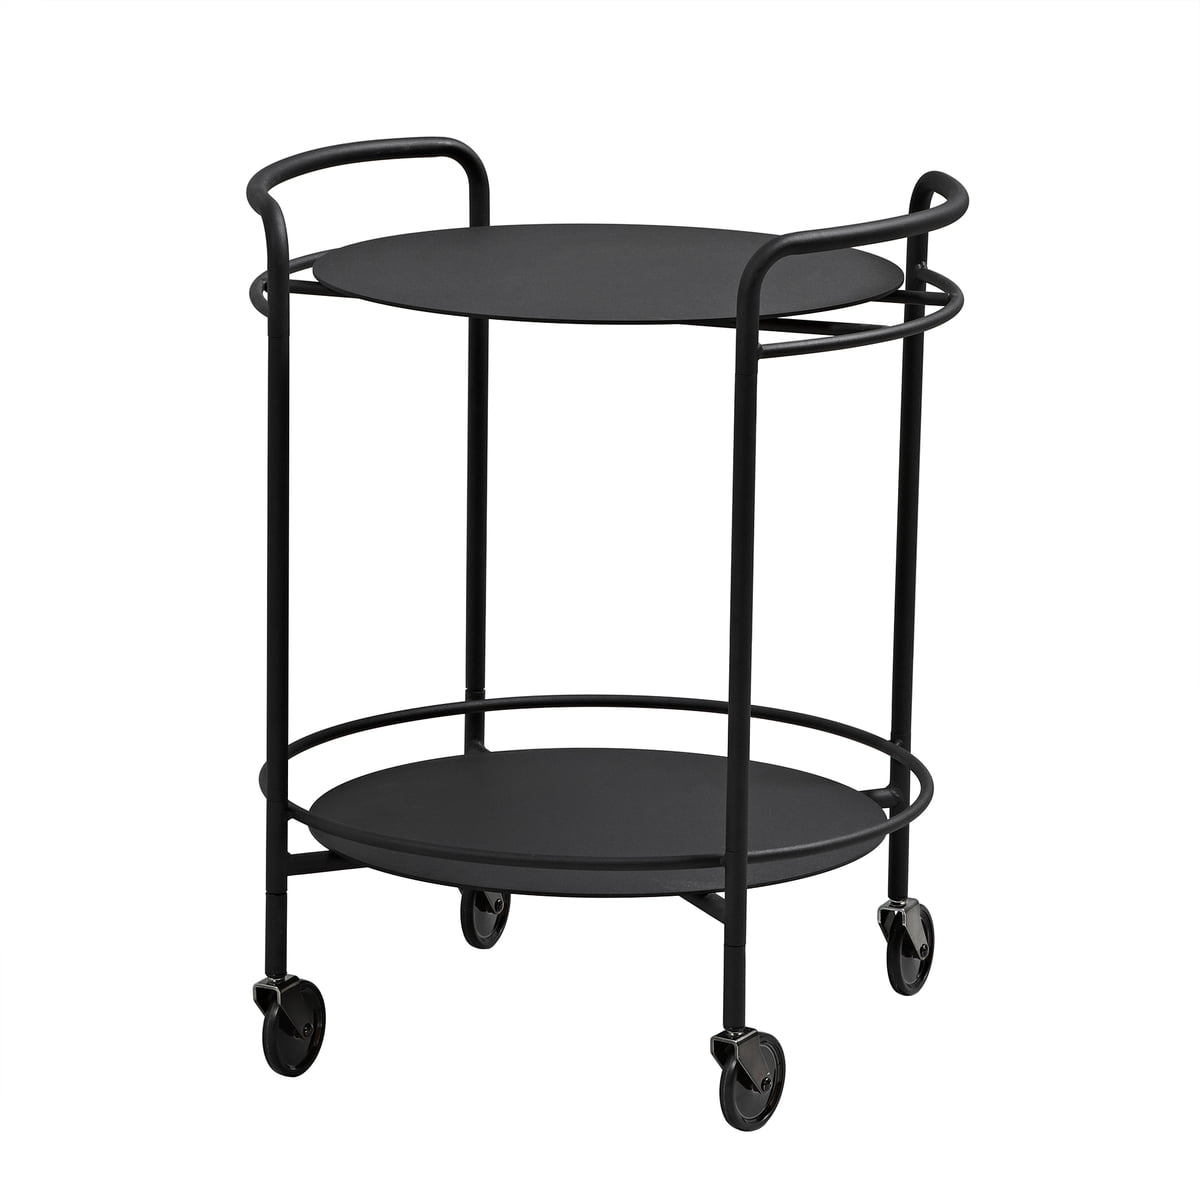 SACKit - SERVEit Table ?- Black (8603000)